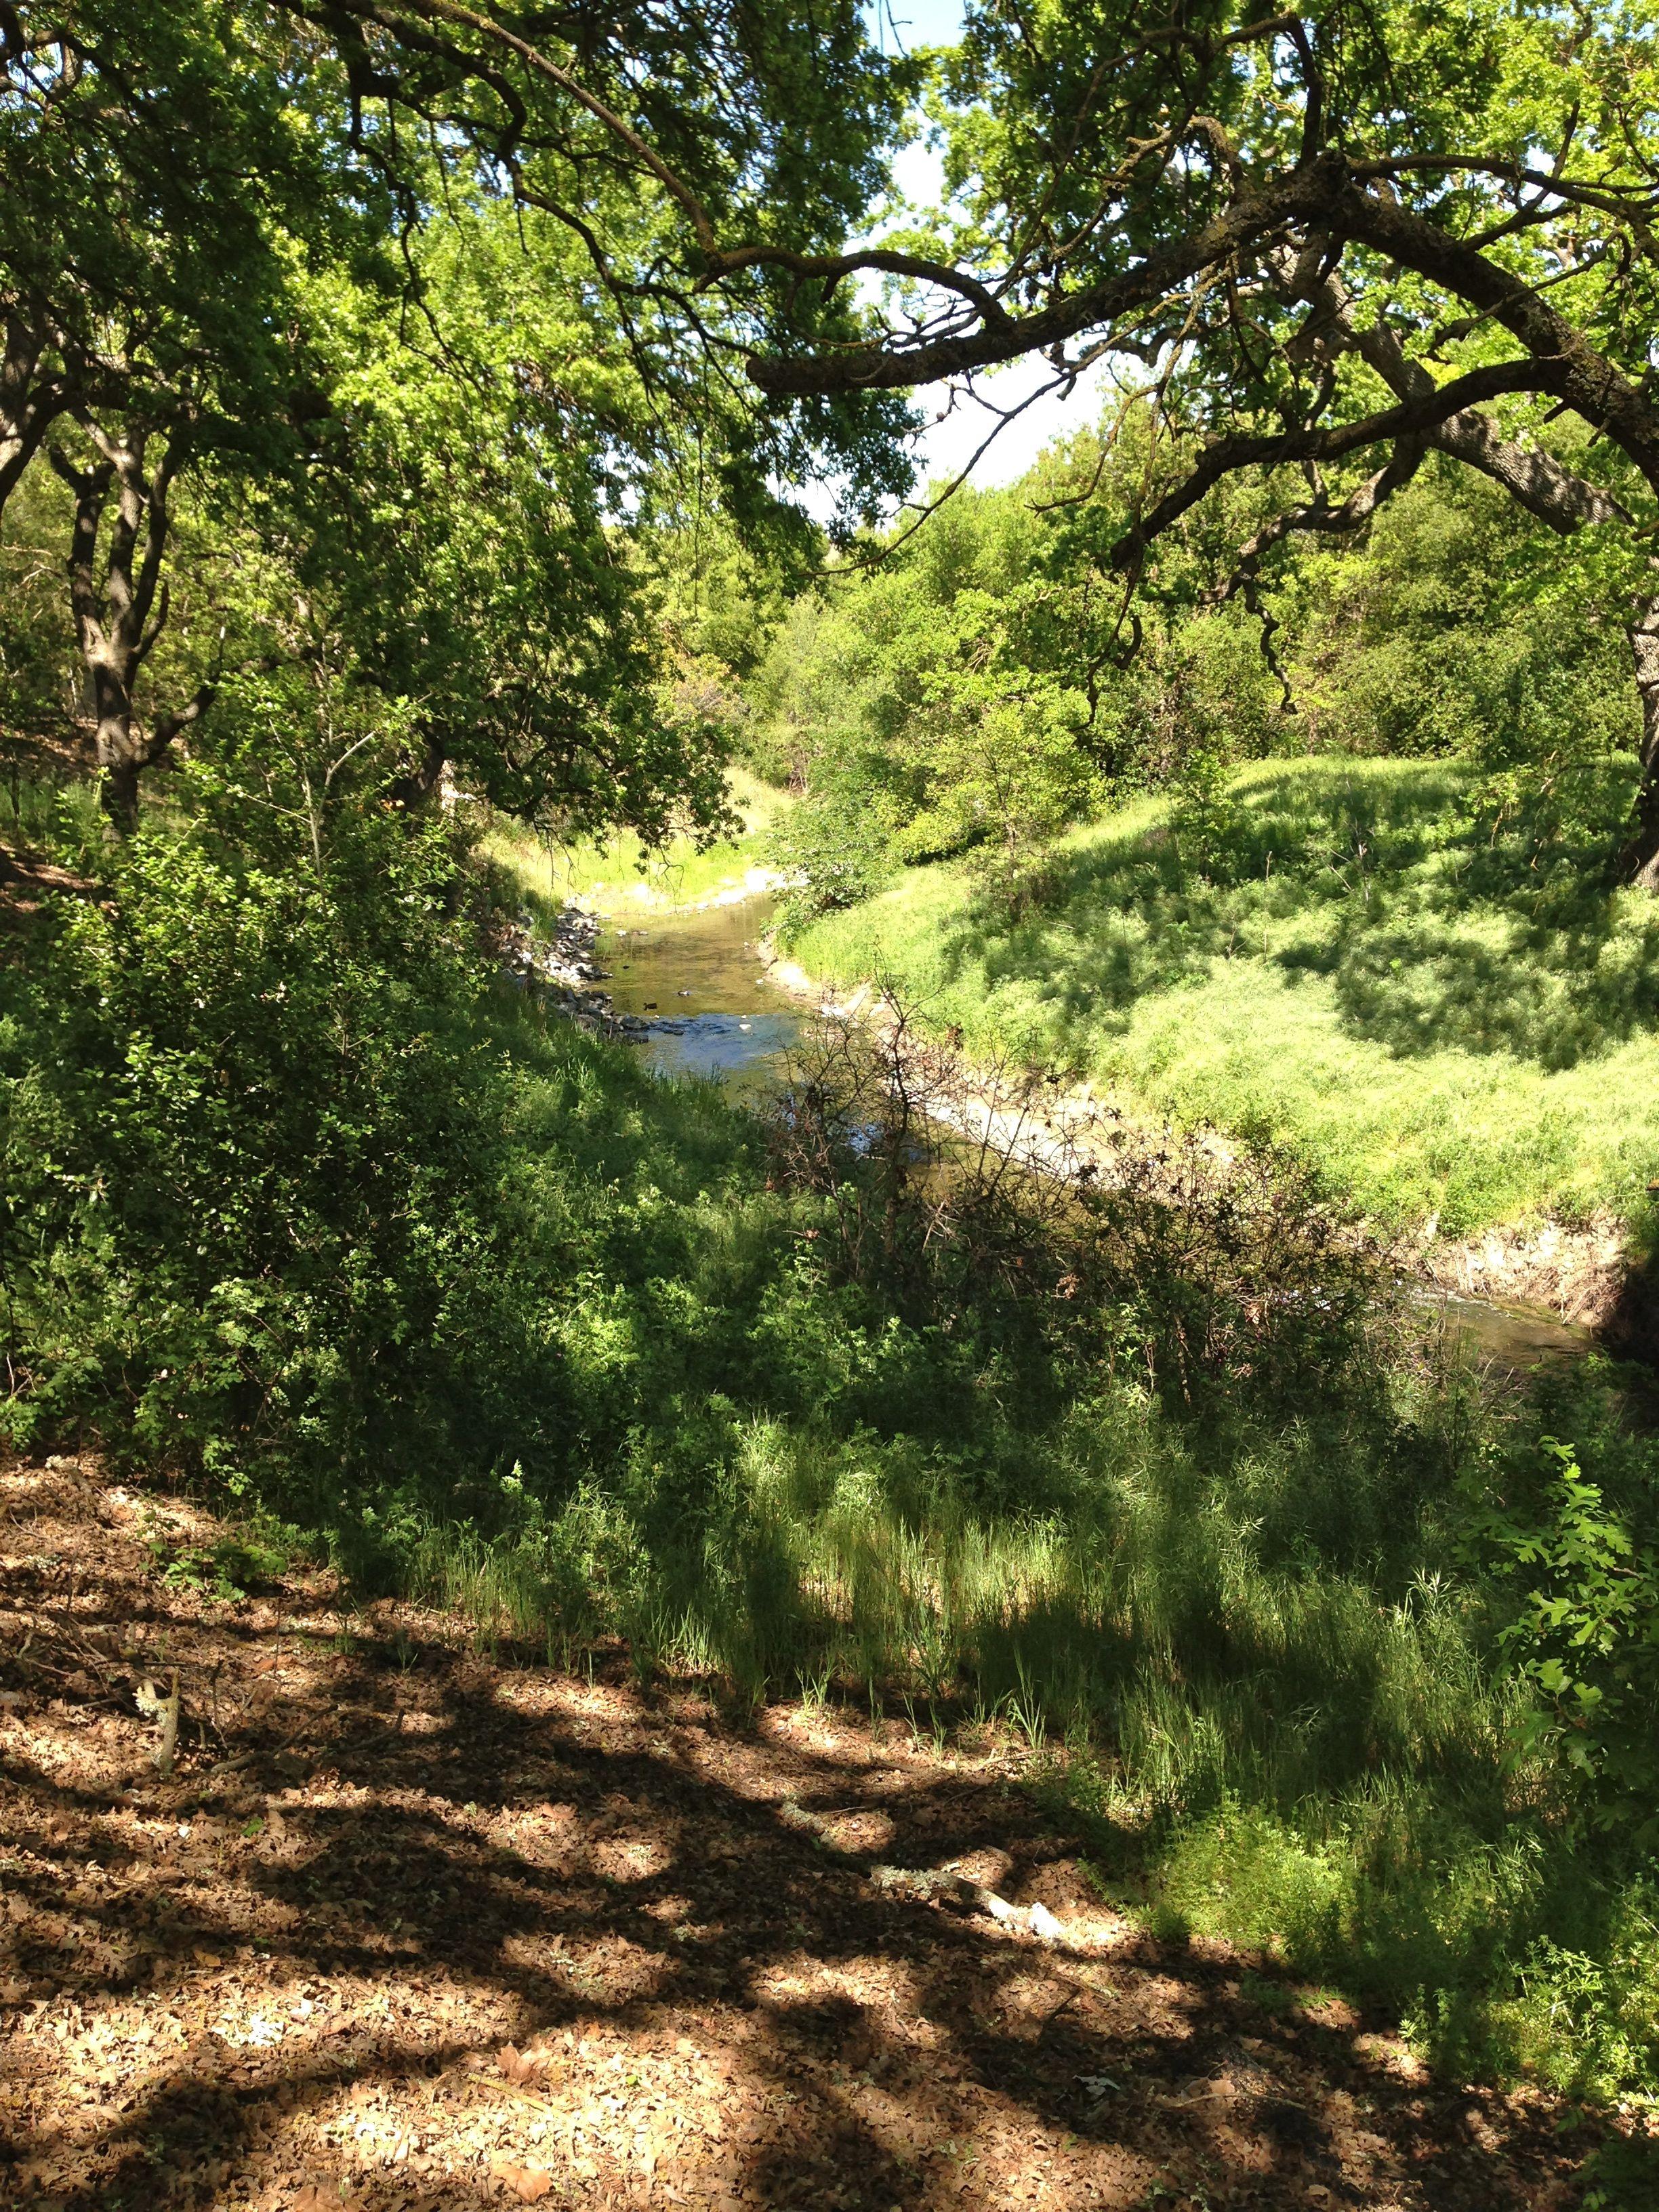 Wonderfully Quiet Stream, Birds Sing, gods peaceful creation...